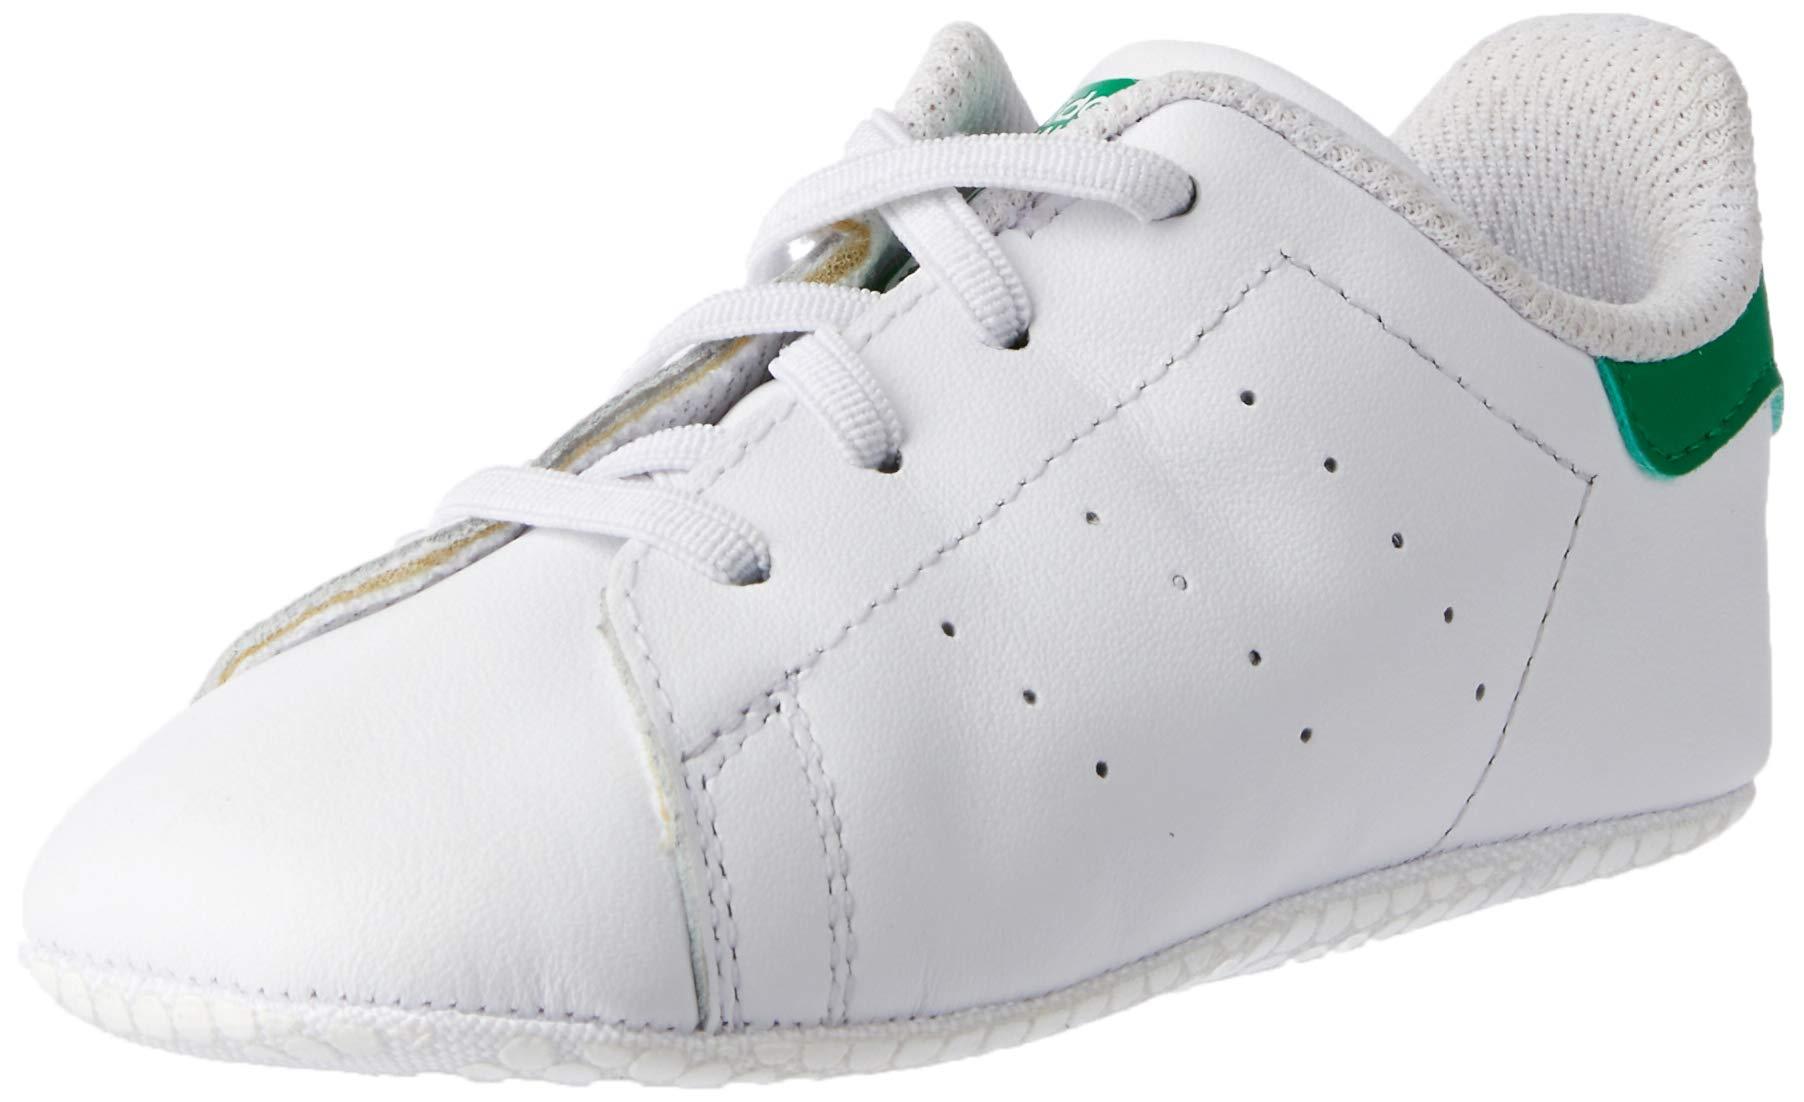 Adidas Baby Boys B24101 First Walking Shoes